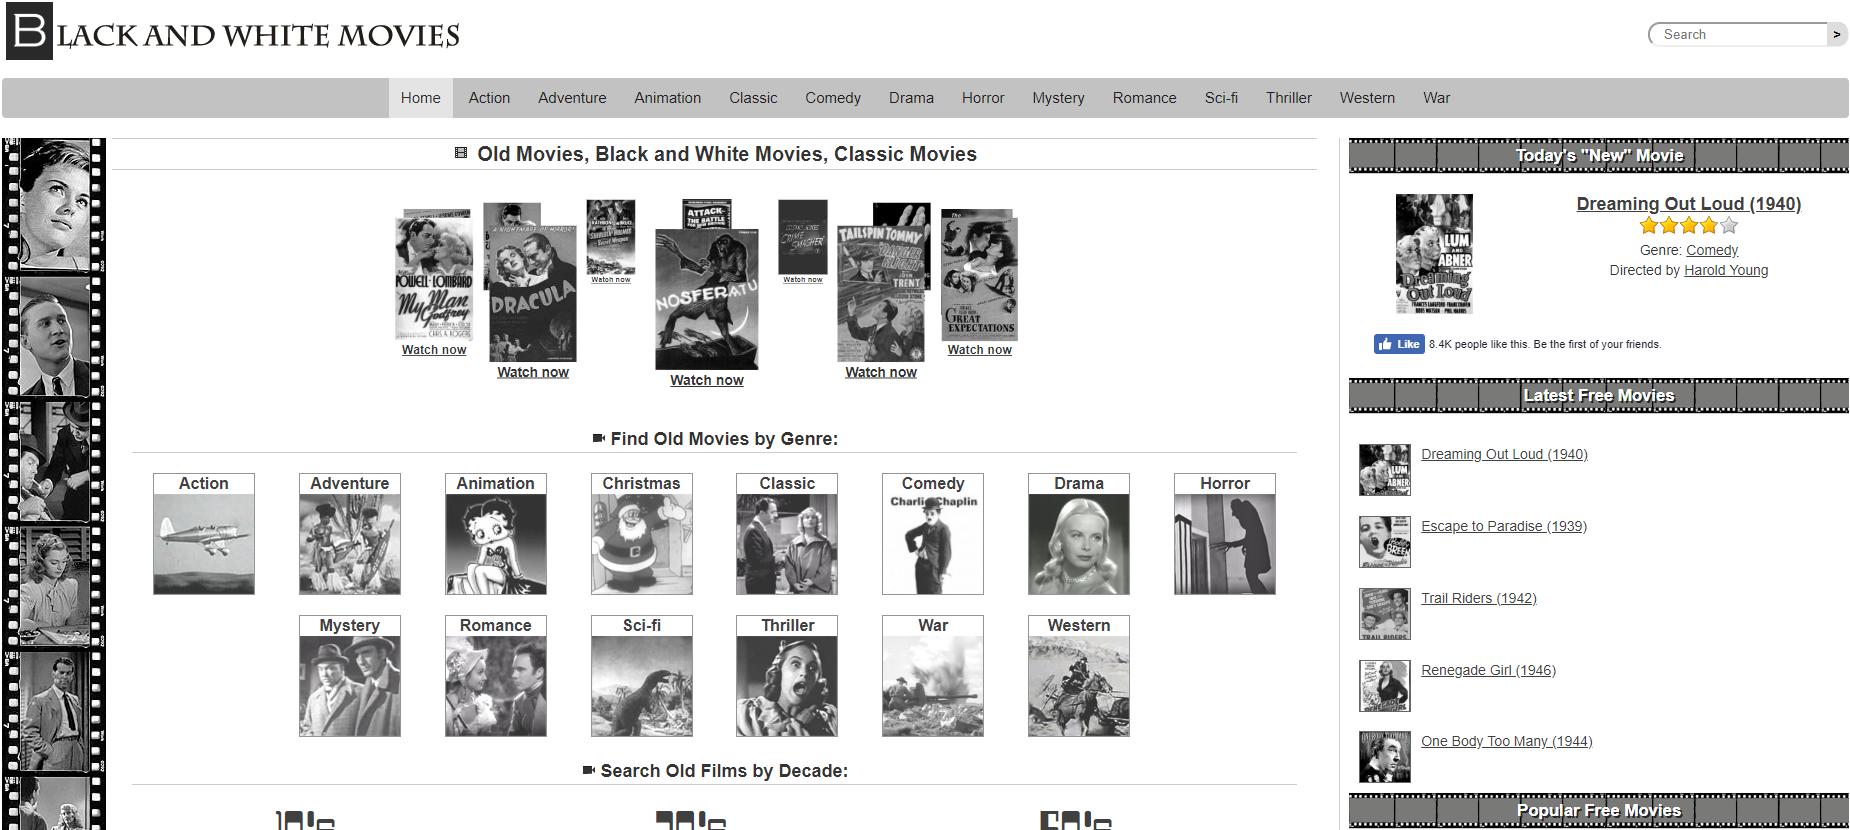 Black and white movies